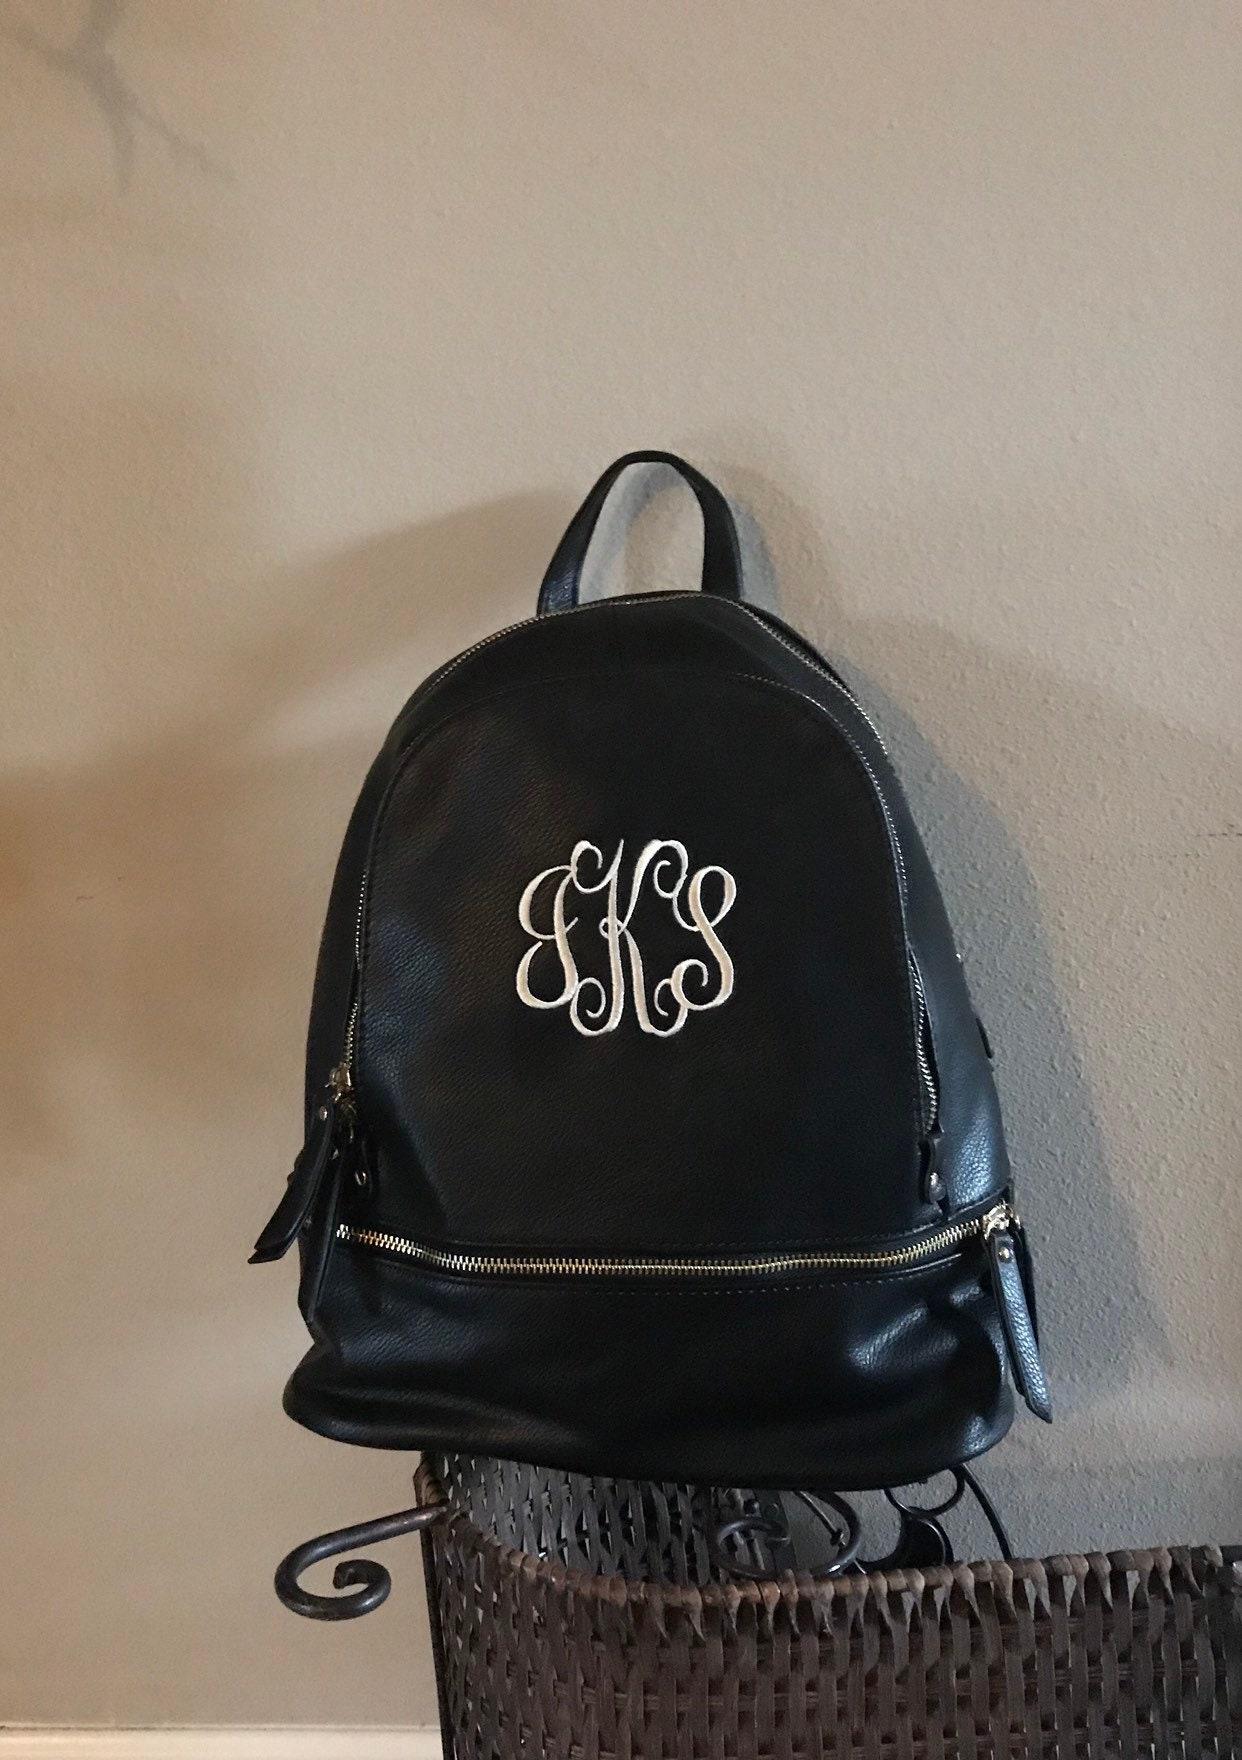 b83f5829b Black backpack Monogrammed, Personalized Backpack, Purse, Backpack, Faux Leather  Backpack, Bag, Travel bag, multipurpose